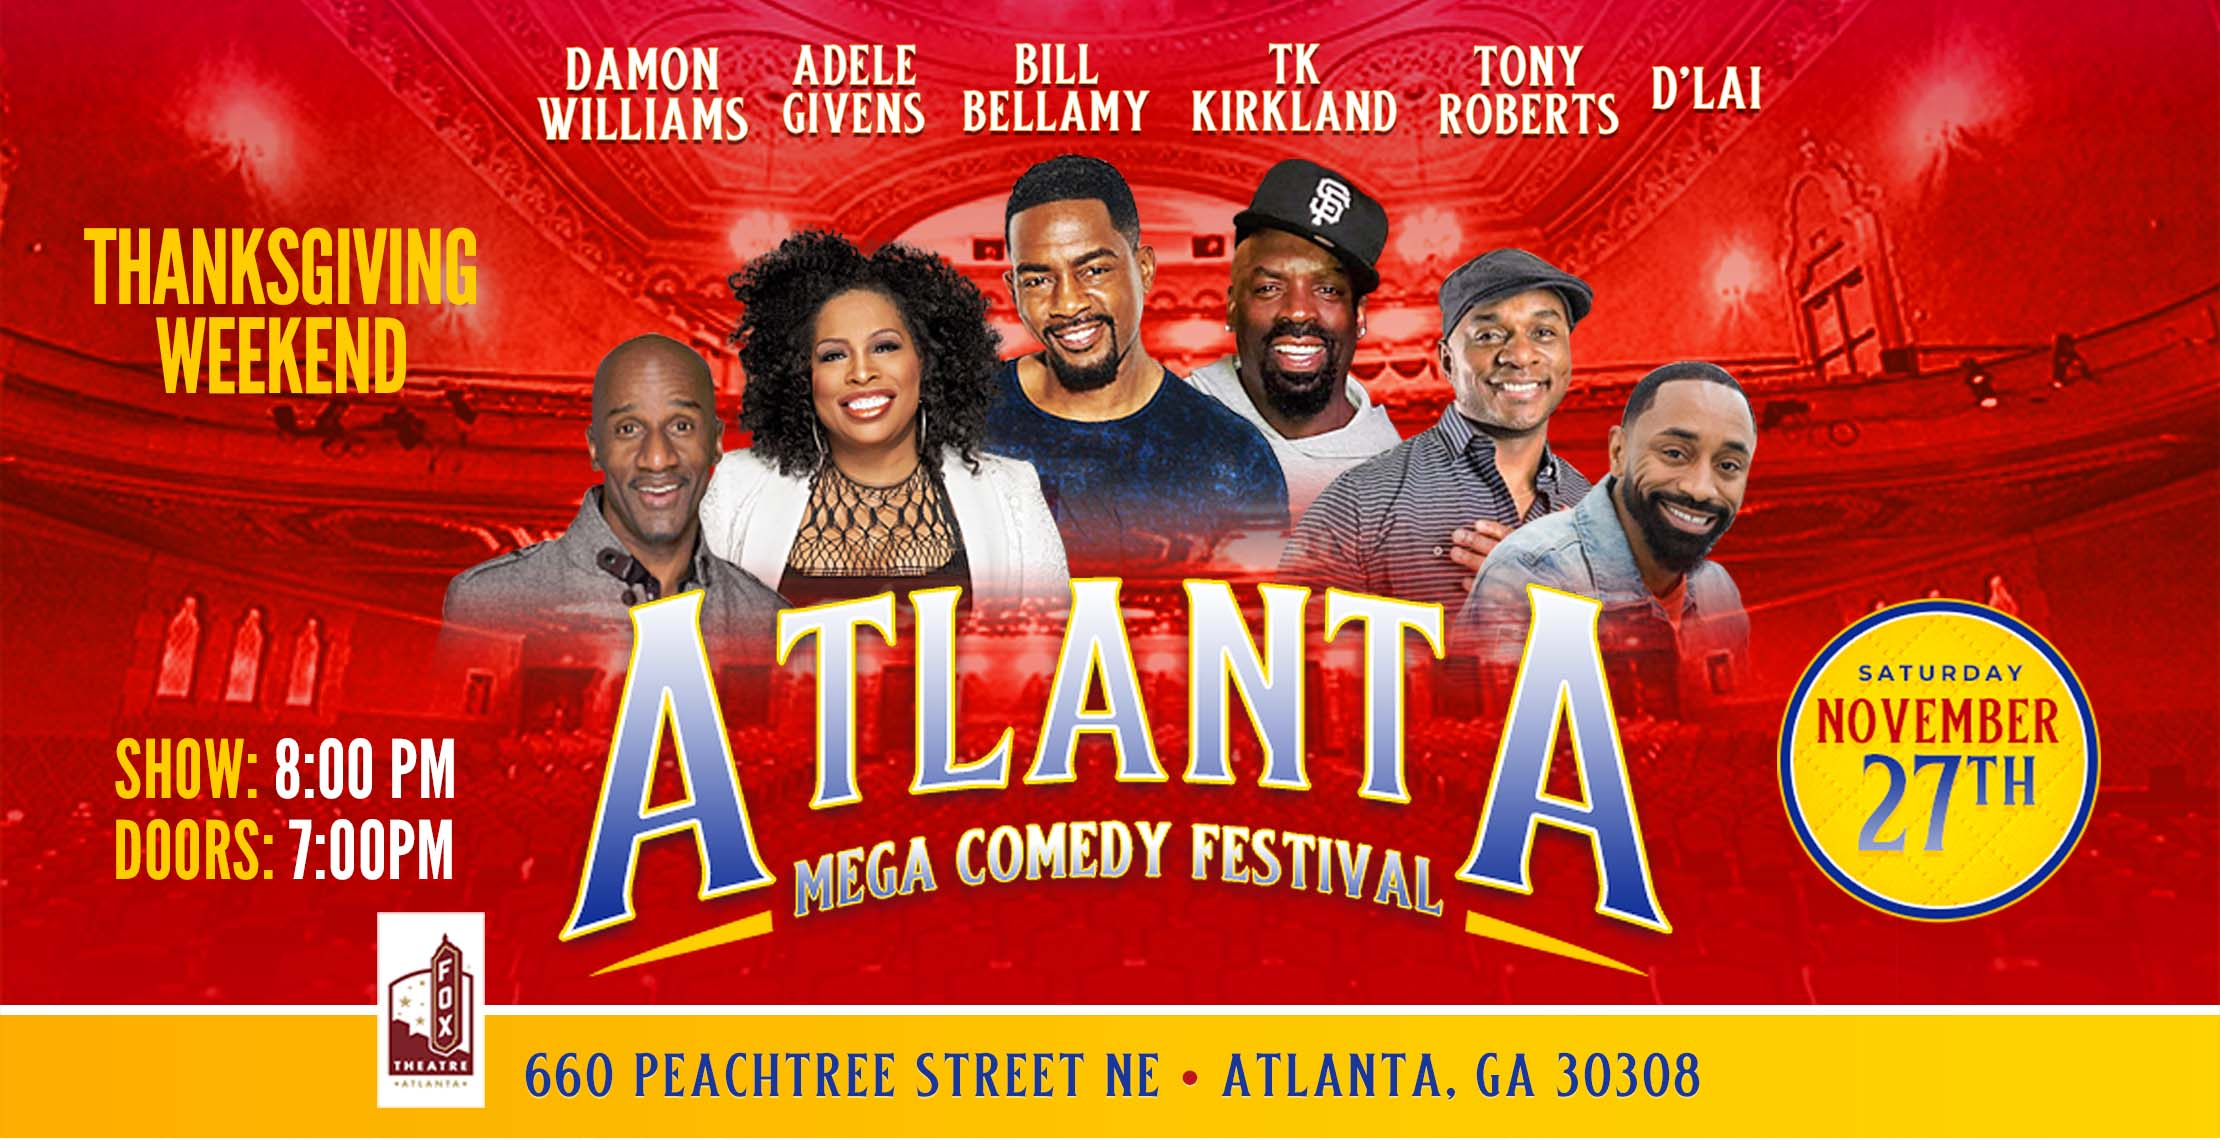 Atlanta Mega Comedy Festival